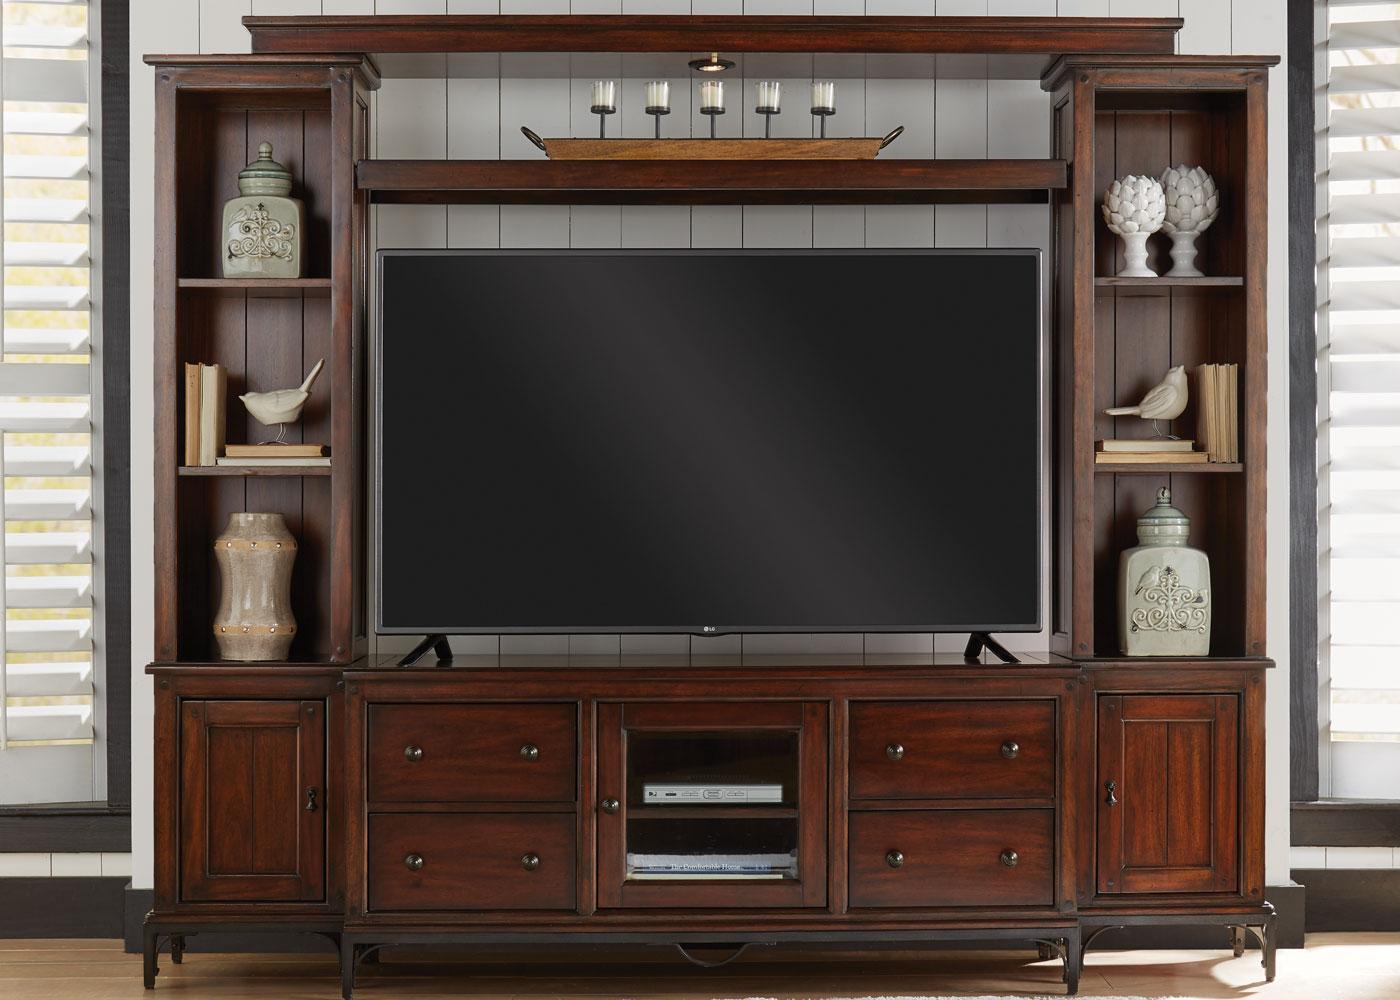 The Best Addresses For Rental Of Furniture In Valdosta Ga